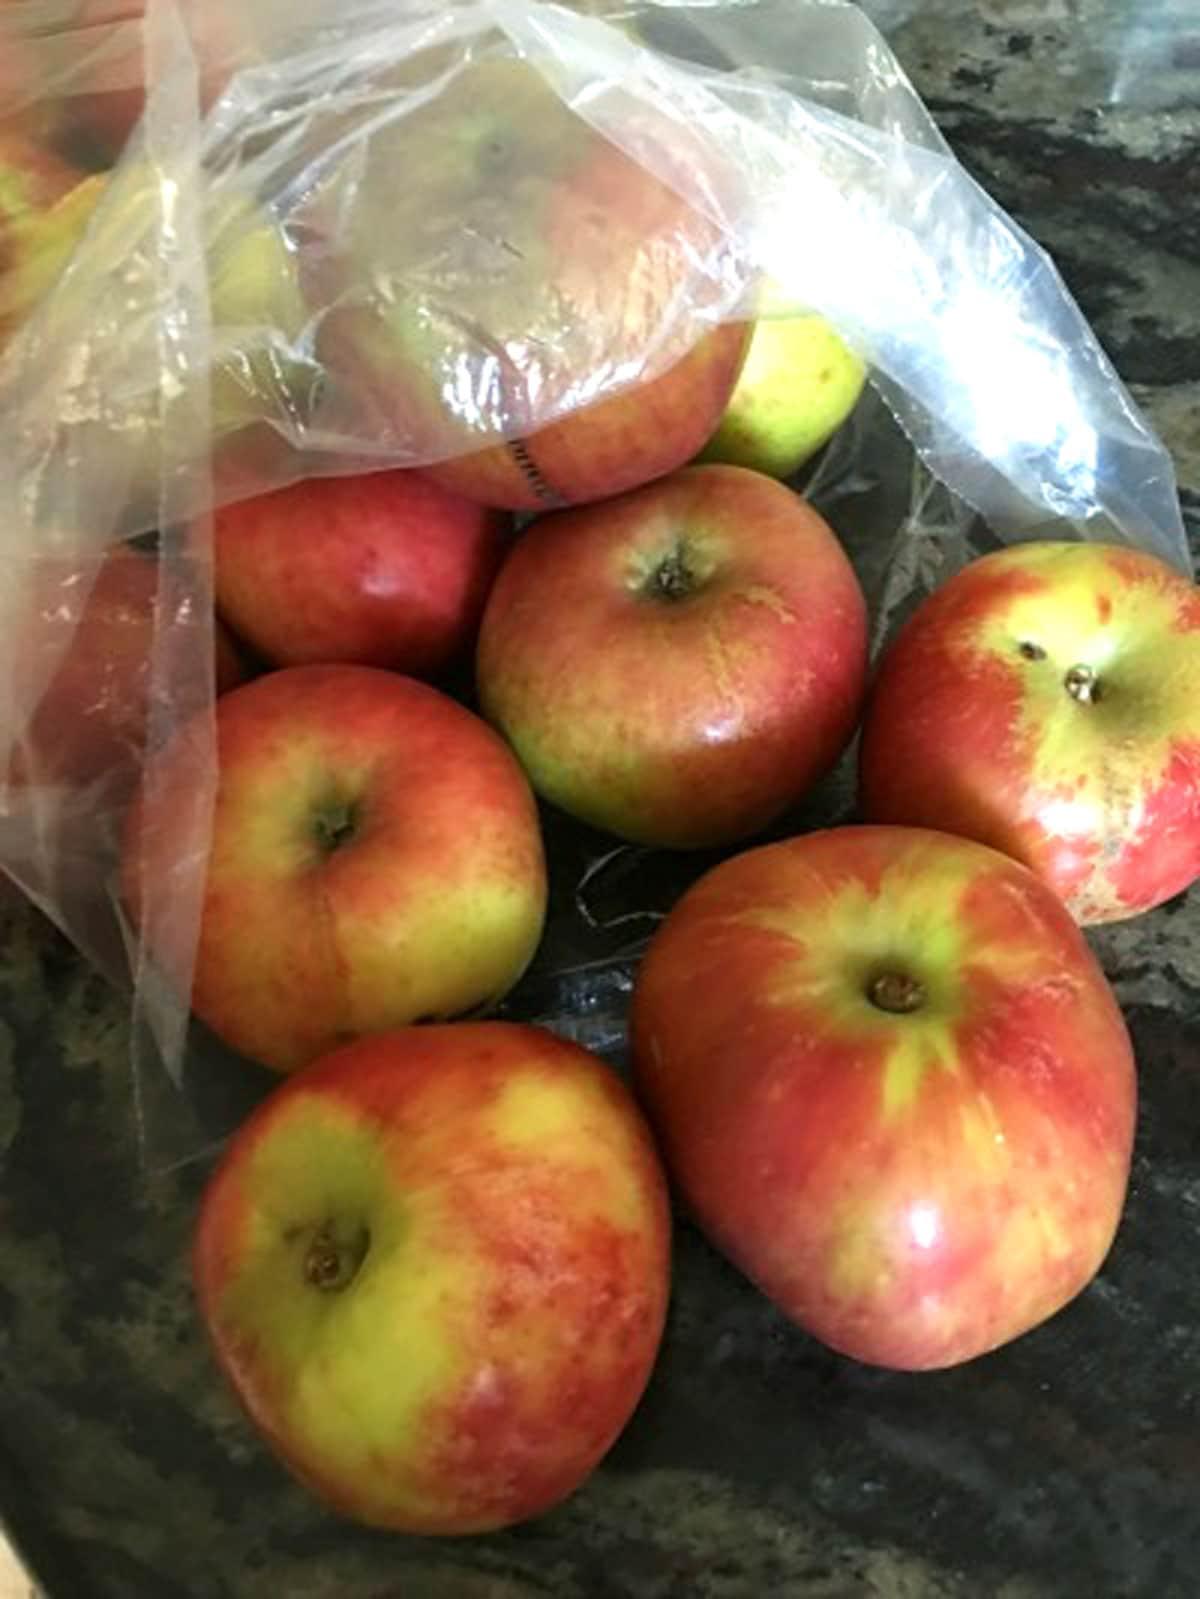 a bag of gravenstein apples